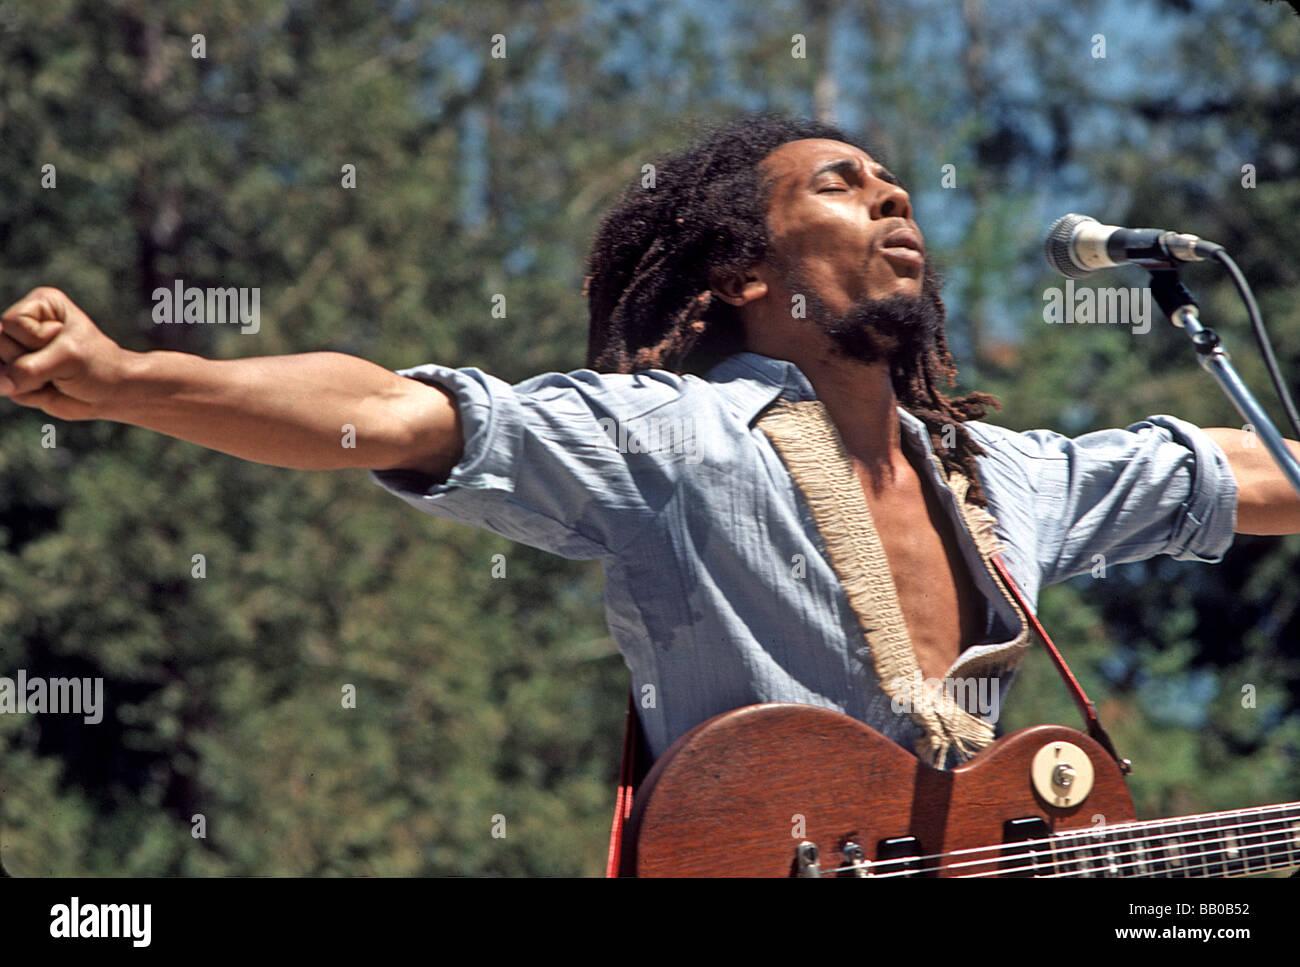 BOB MARLEY (1945-1981) Jamaican reggae musician at the Santa Barbara Bowl in 1976. Photo Jeffrey Mayer - Stock Image